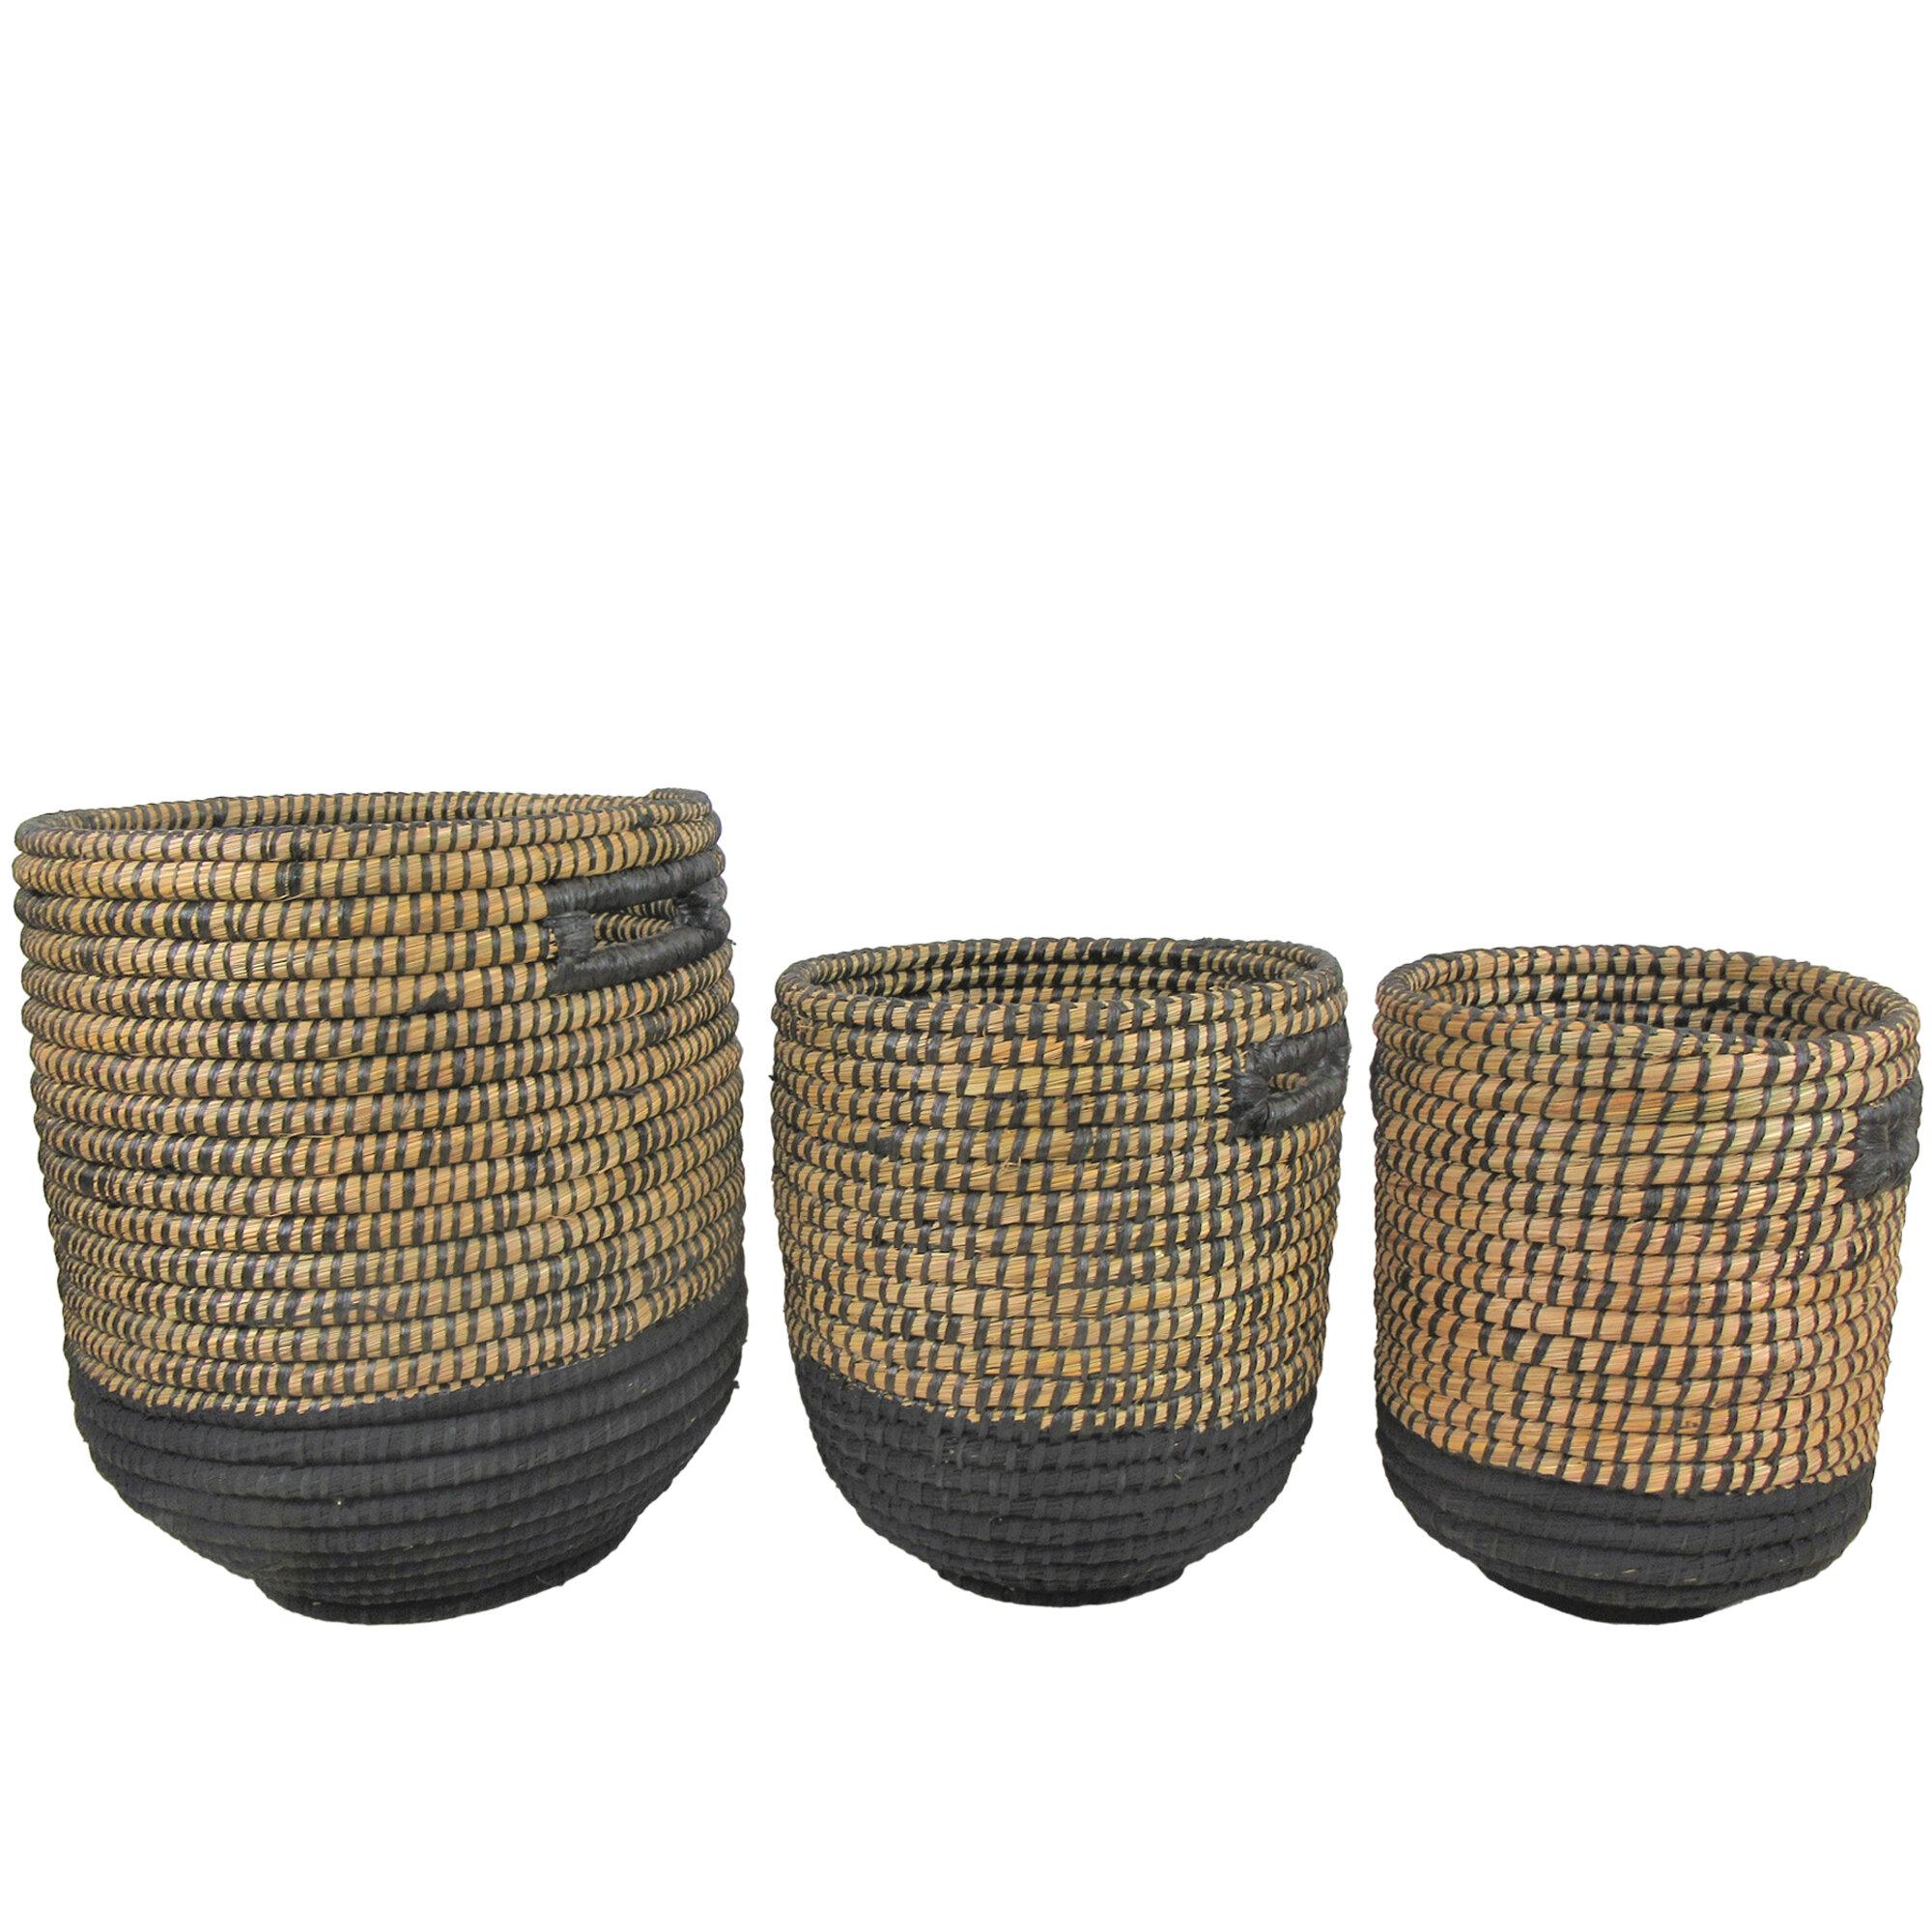 Bay Isle Home 3 Piece Seagrass Basket Set Reviews Wayfair